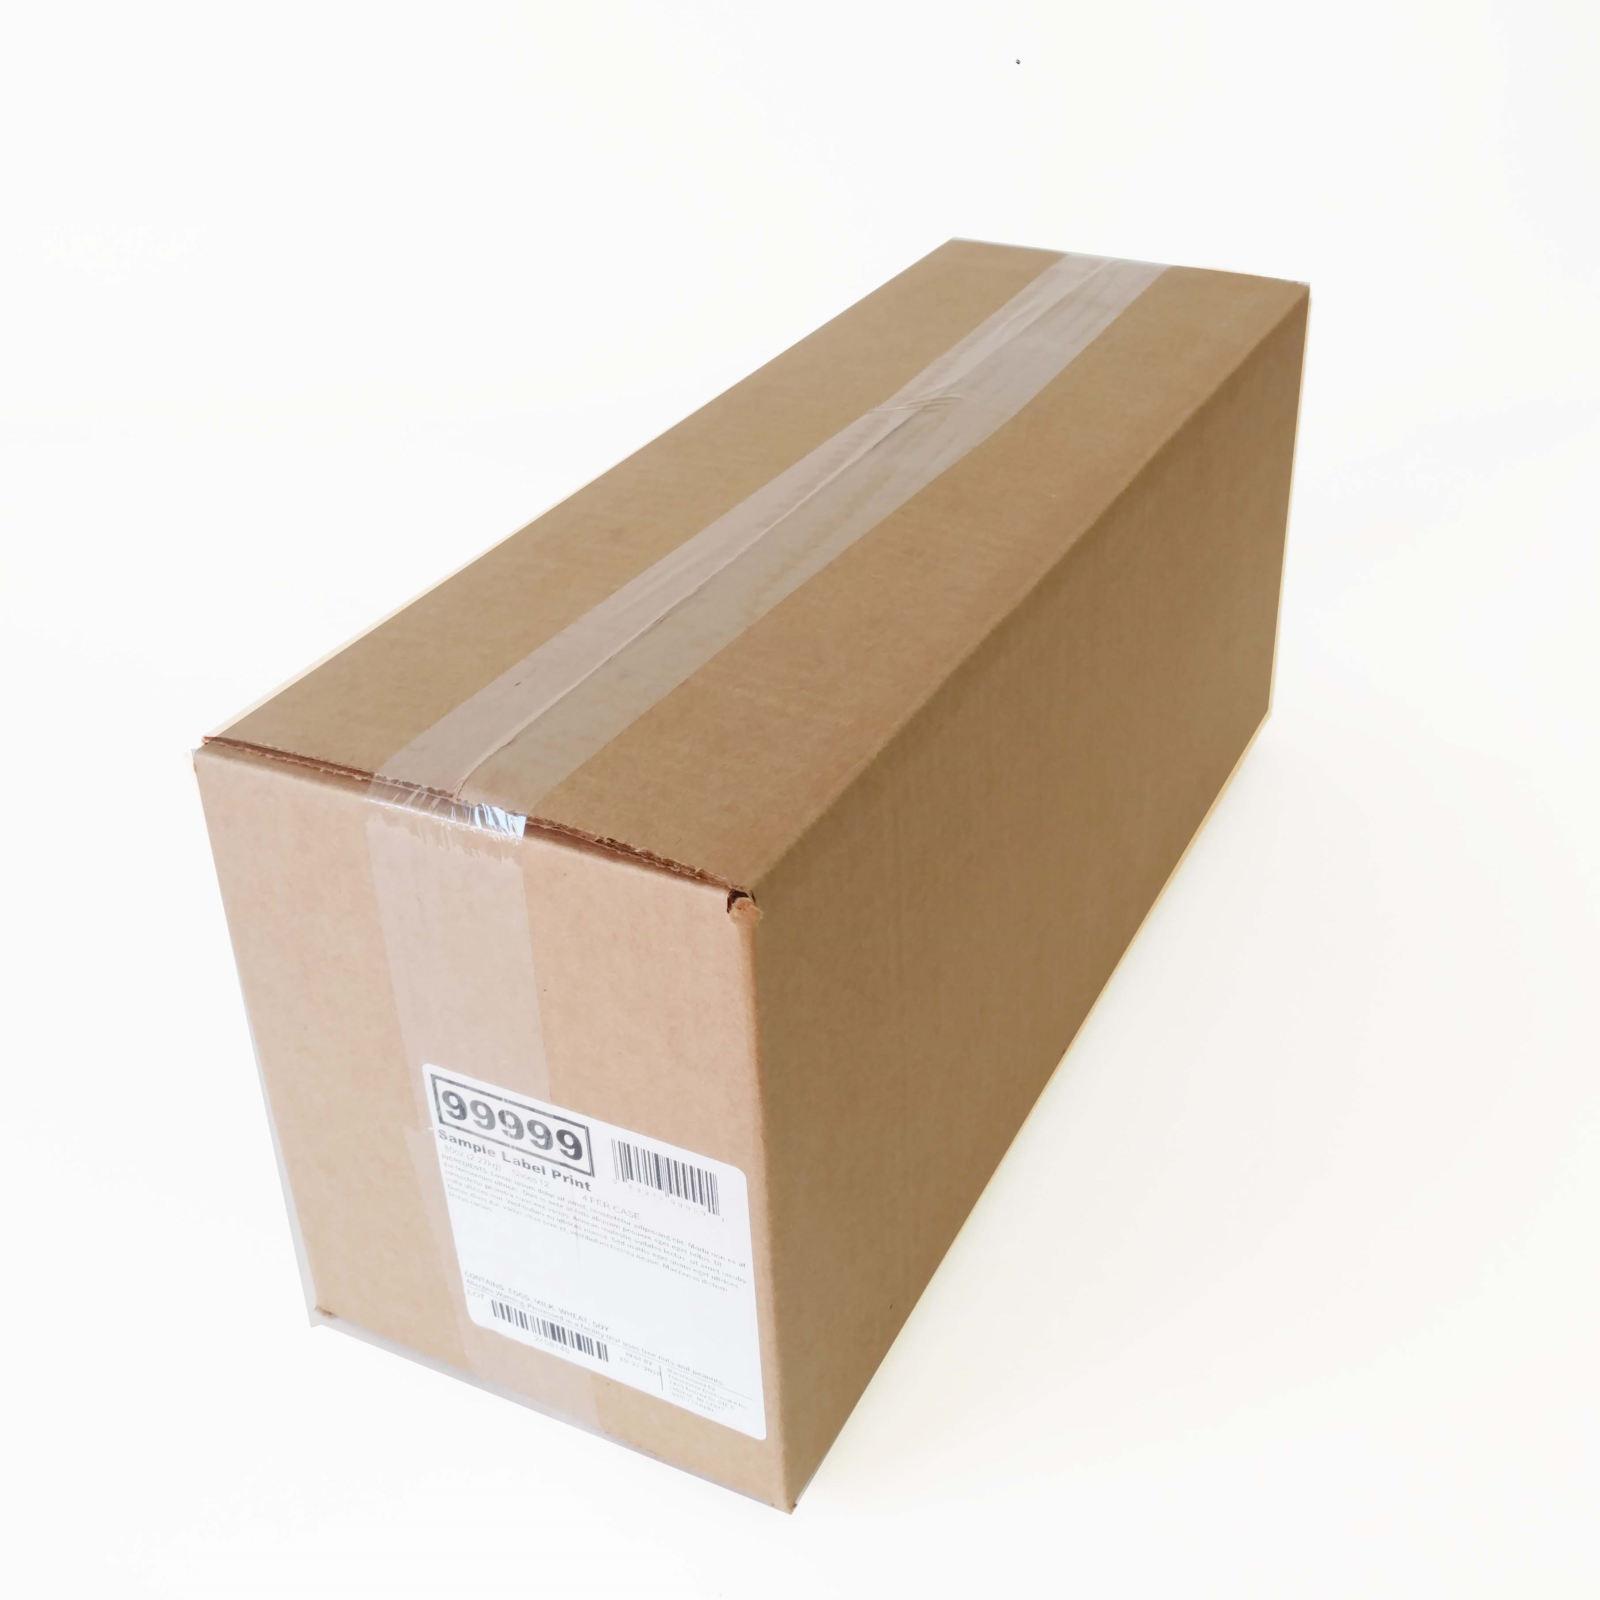 Open master case product image